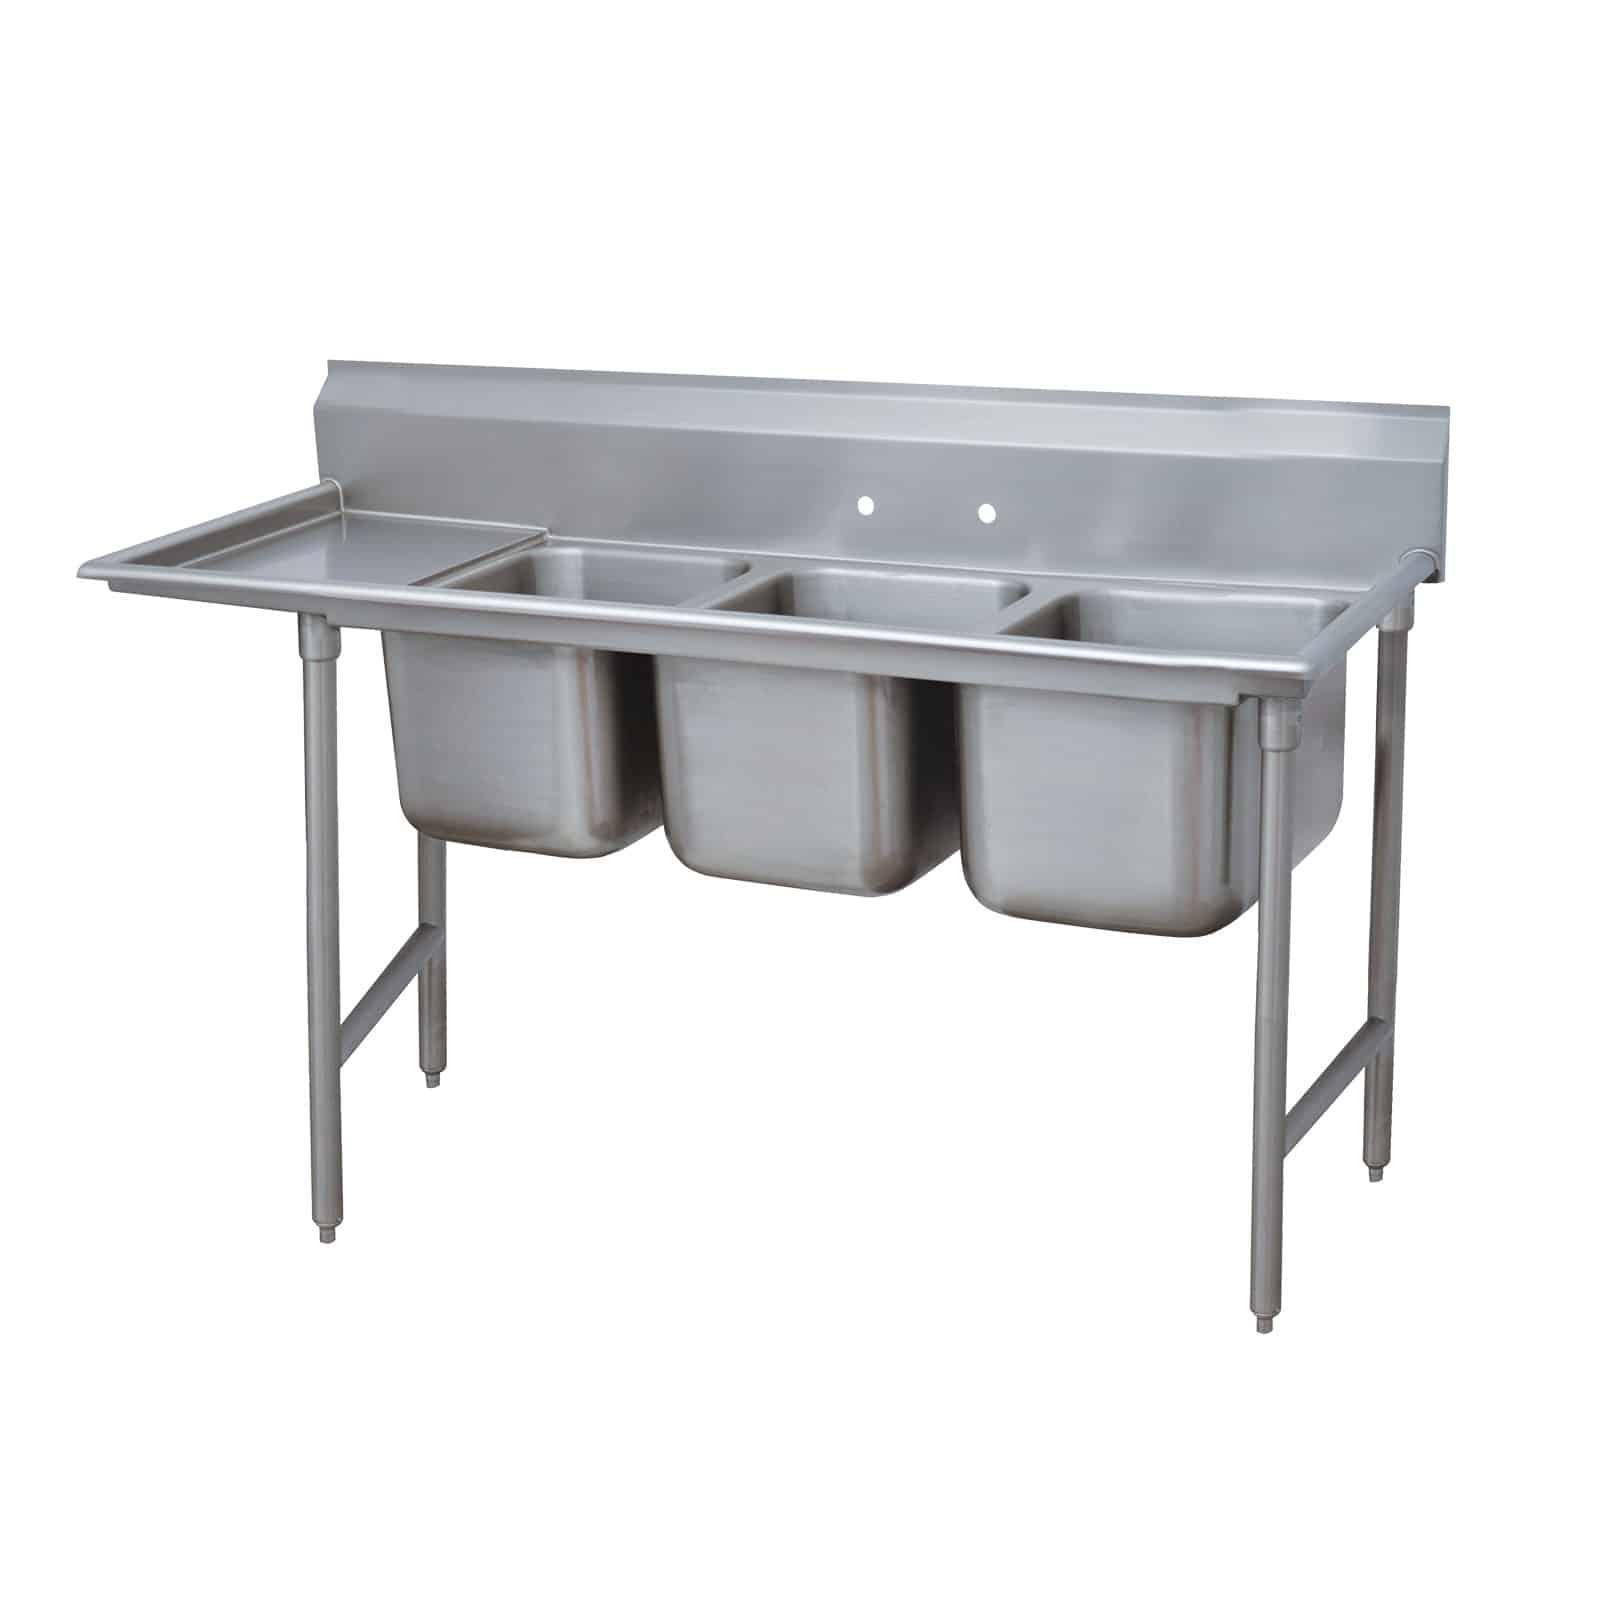 Tabco Kitchen Sinks